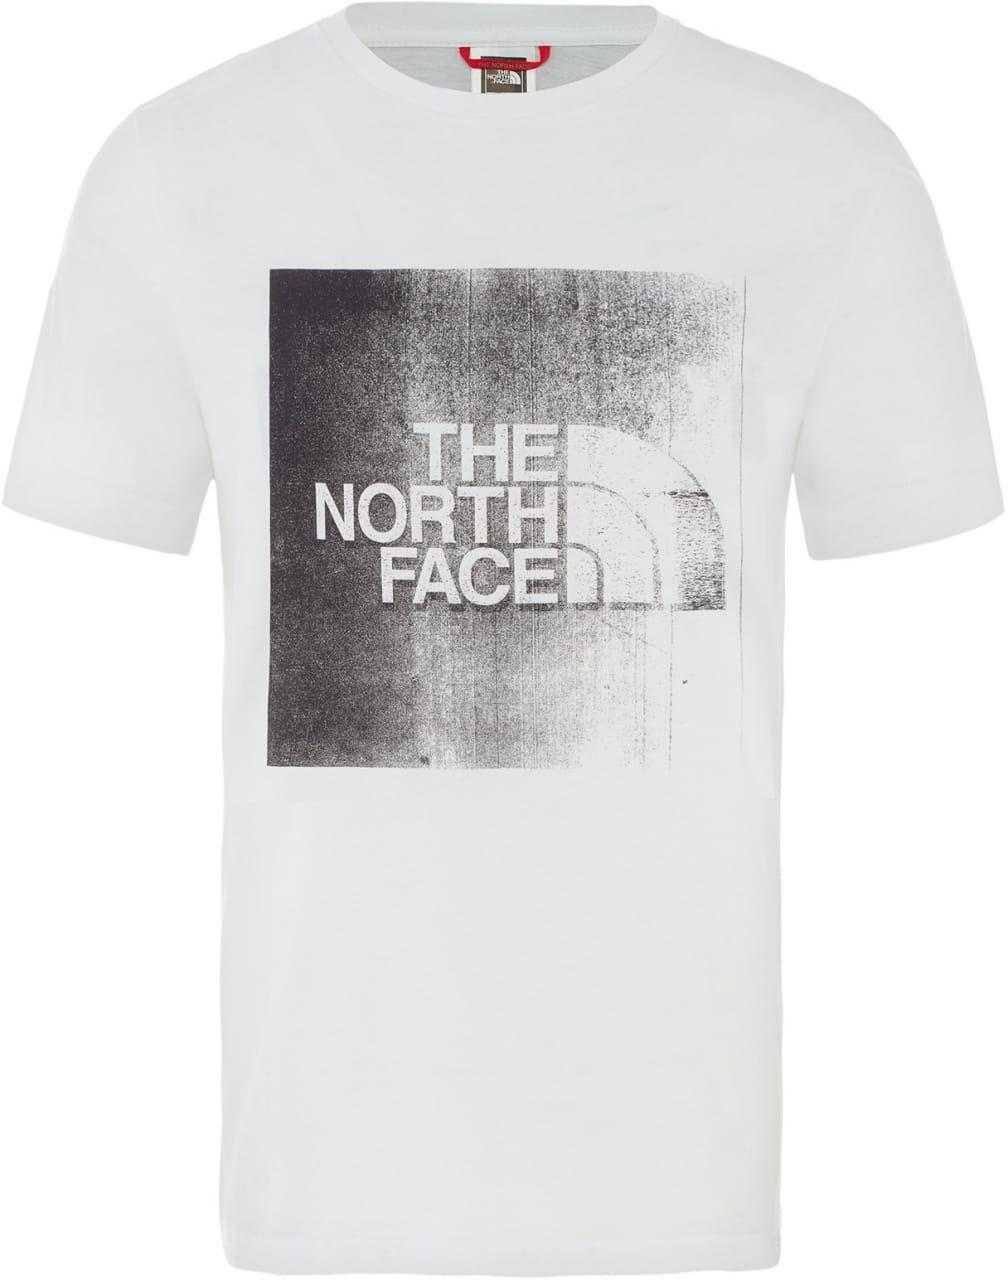 T-Shirts The North Face Men's Xrx T-Shirt